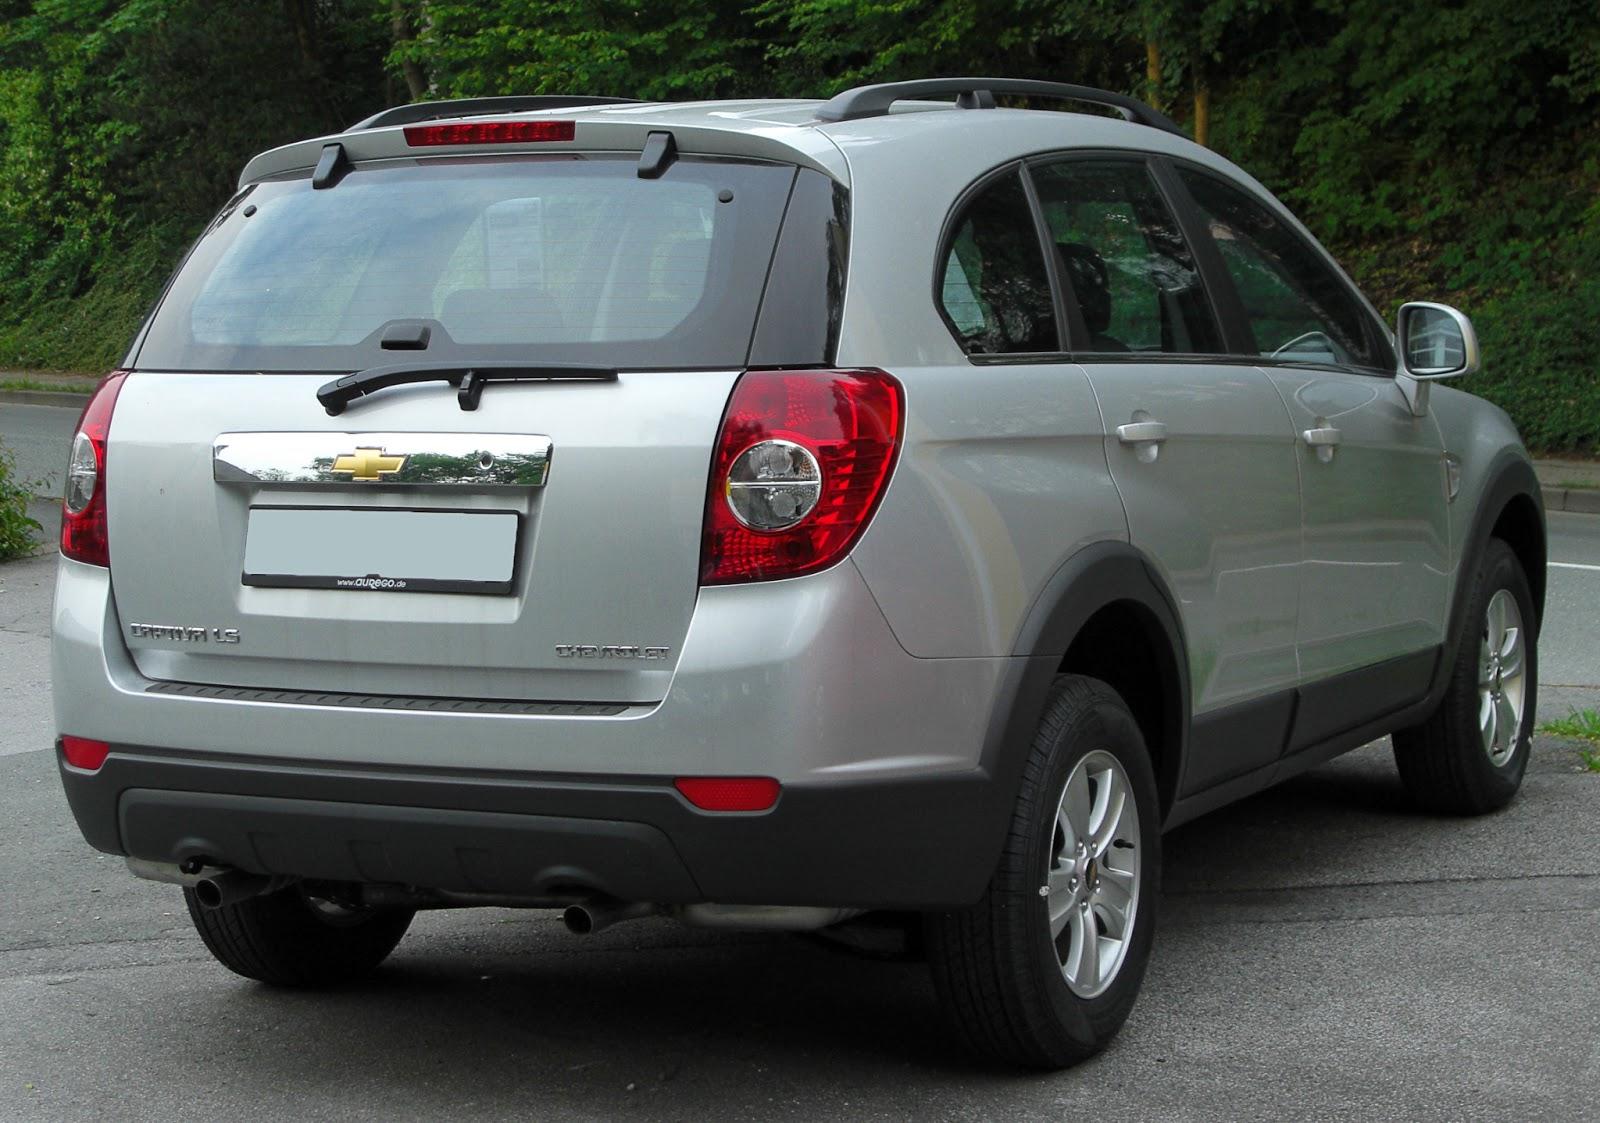 Jeepler Chevrolet Captiva 2013. Yeni jenerasyon otomobillere genel bakış 9